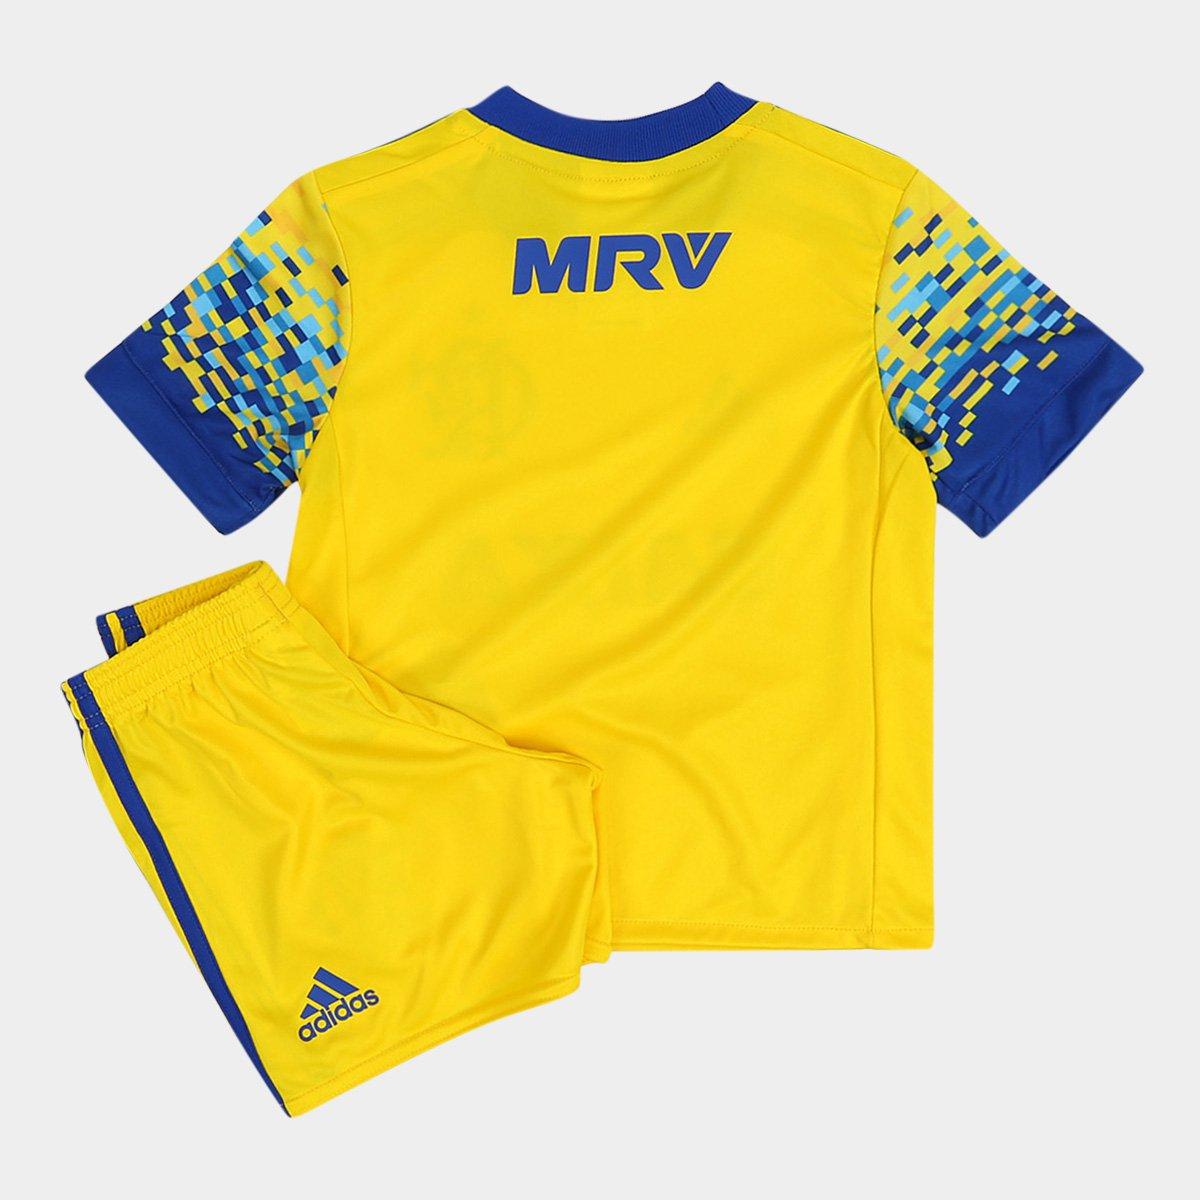 Kit Flamengo Infantil III 17 18 Adidas - Compre Agora  f40c8176a5b37